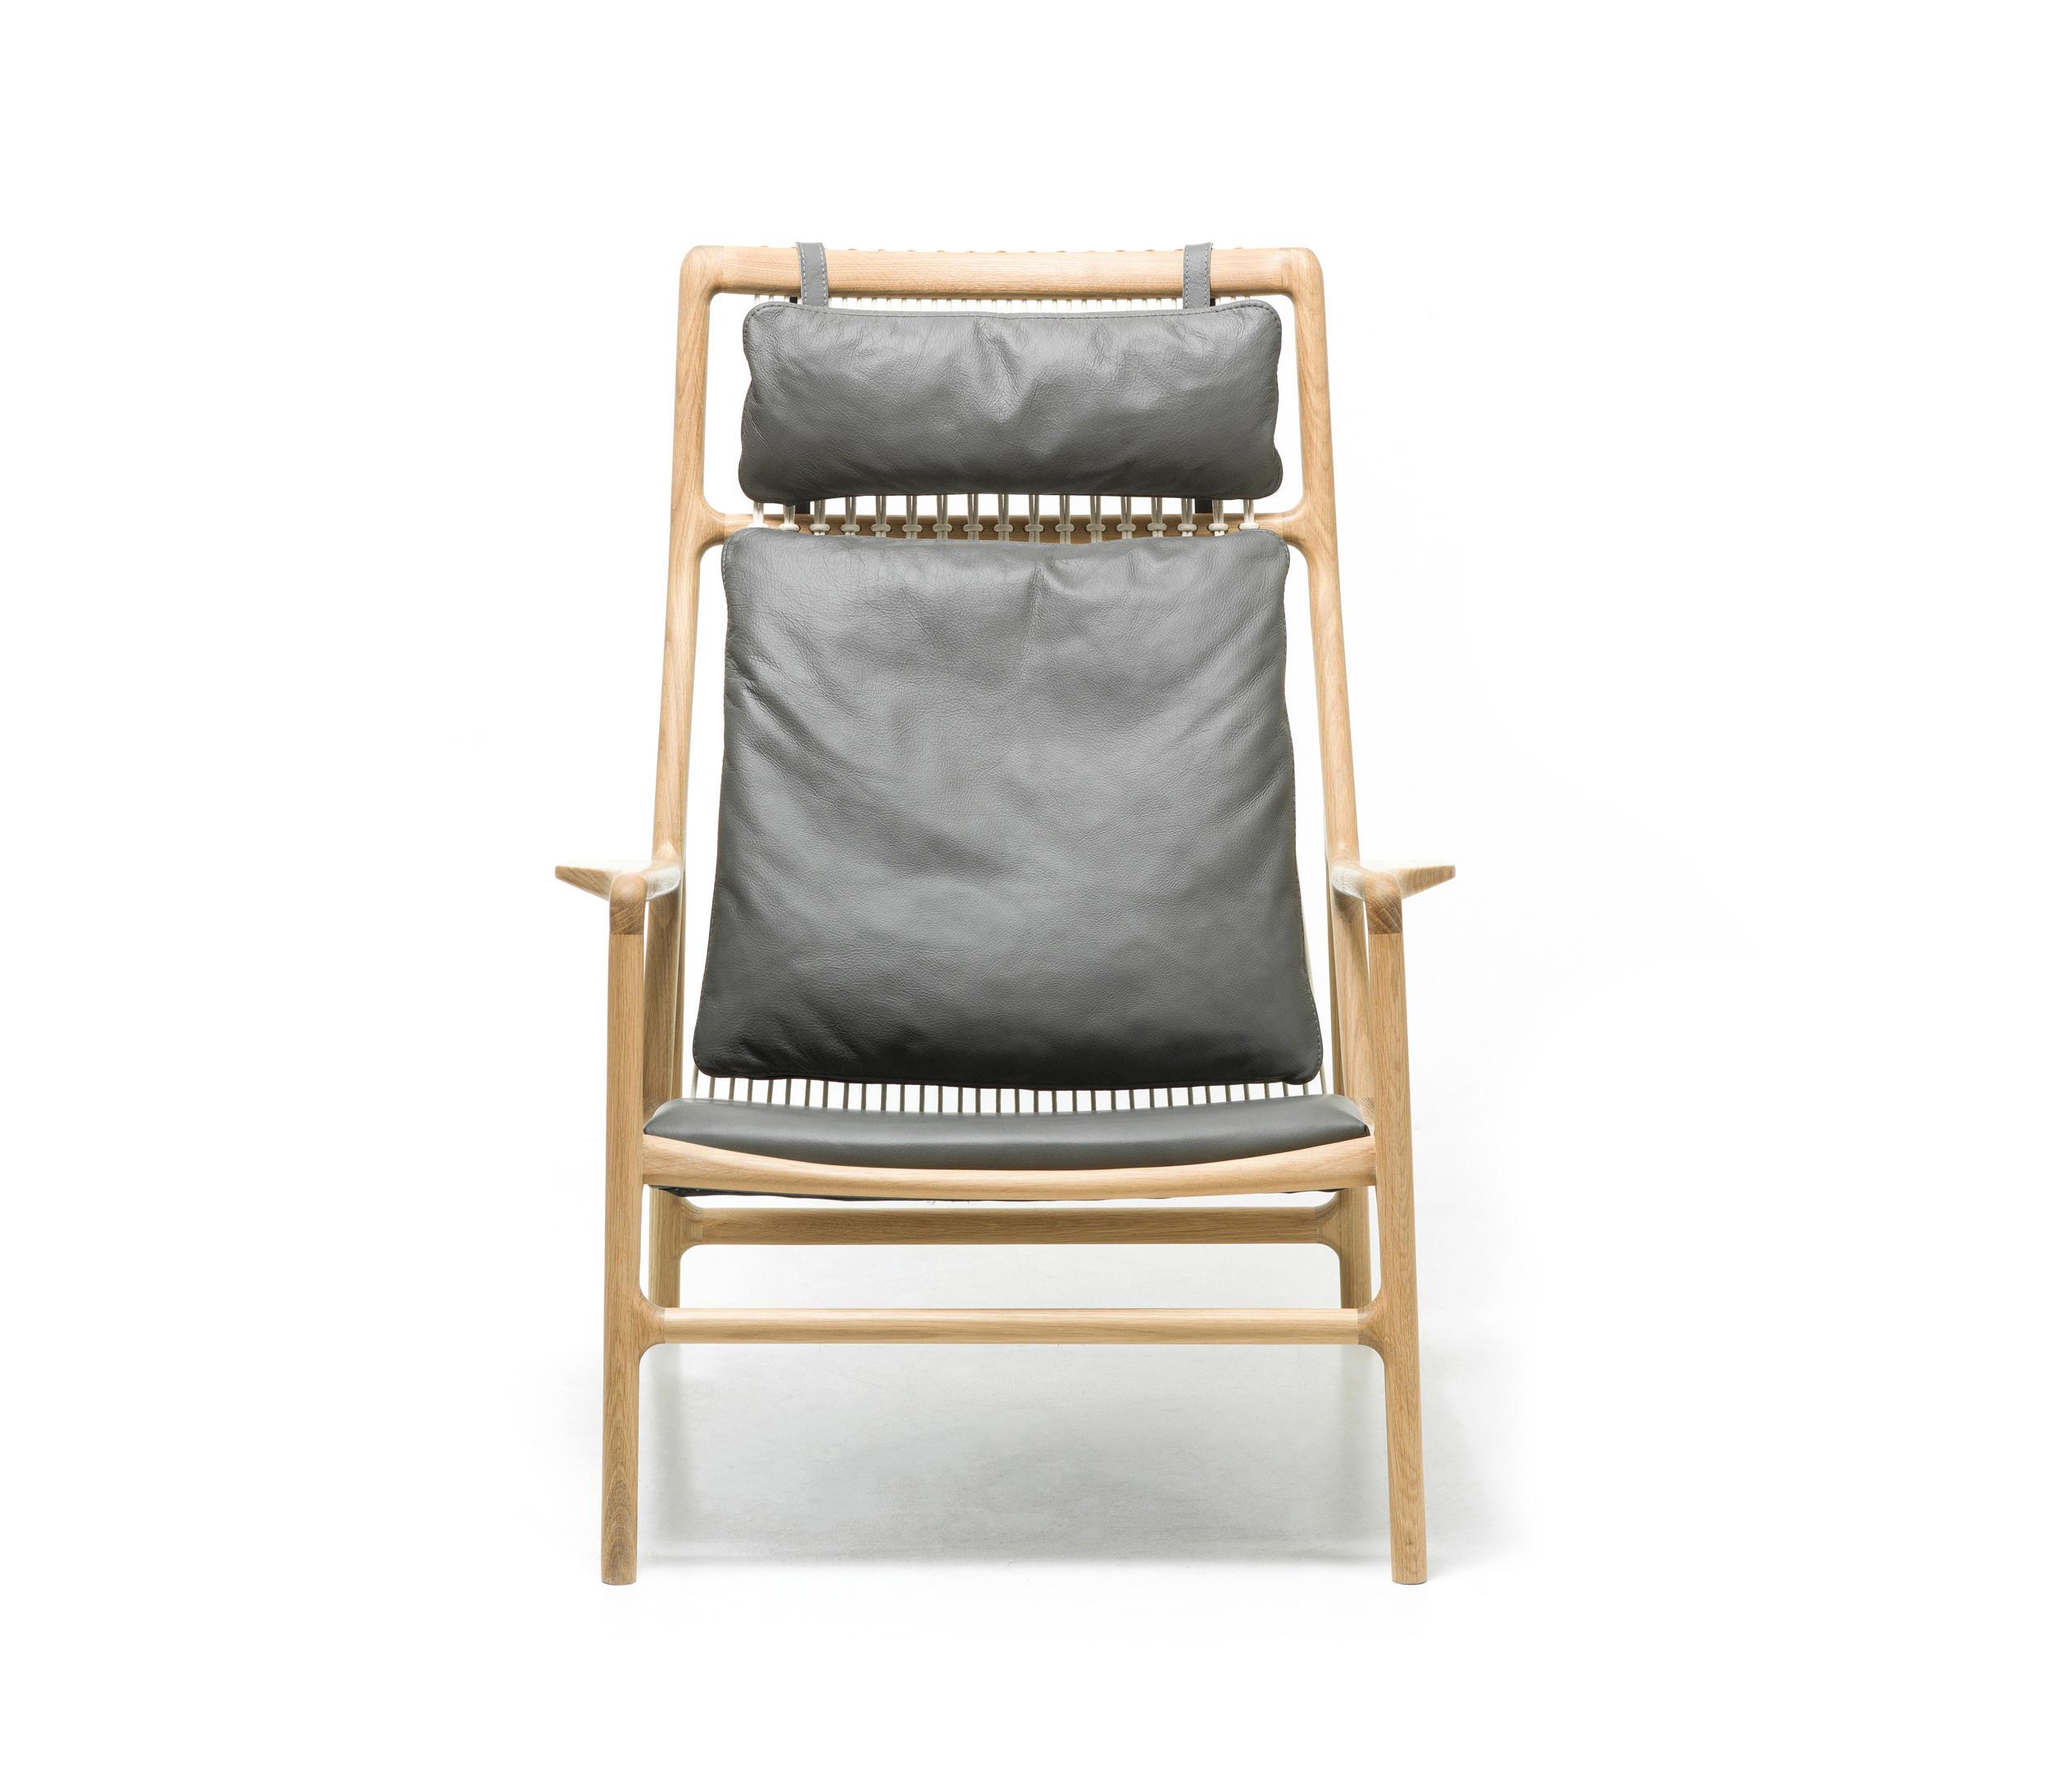 Accessoires Salle De Bain Dakar ~ fawn dedo lounge chair dakar fauteuils de gazzda architonic